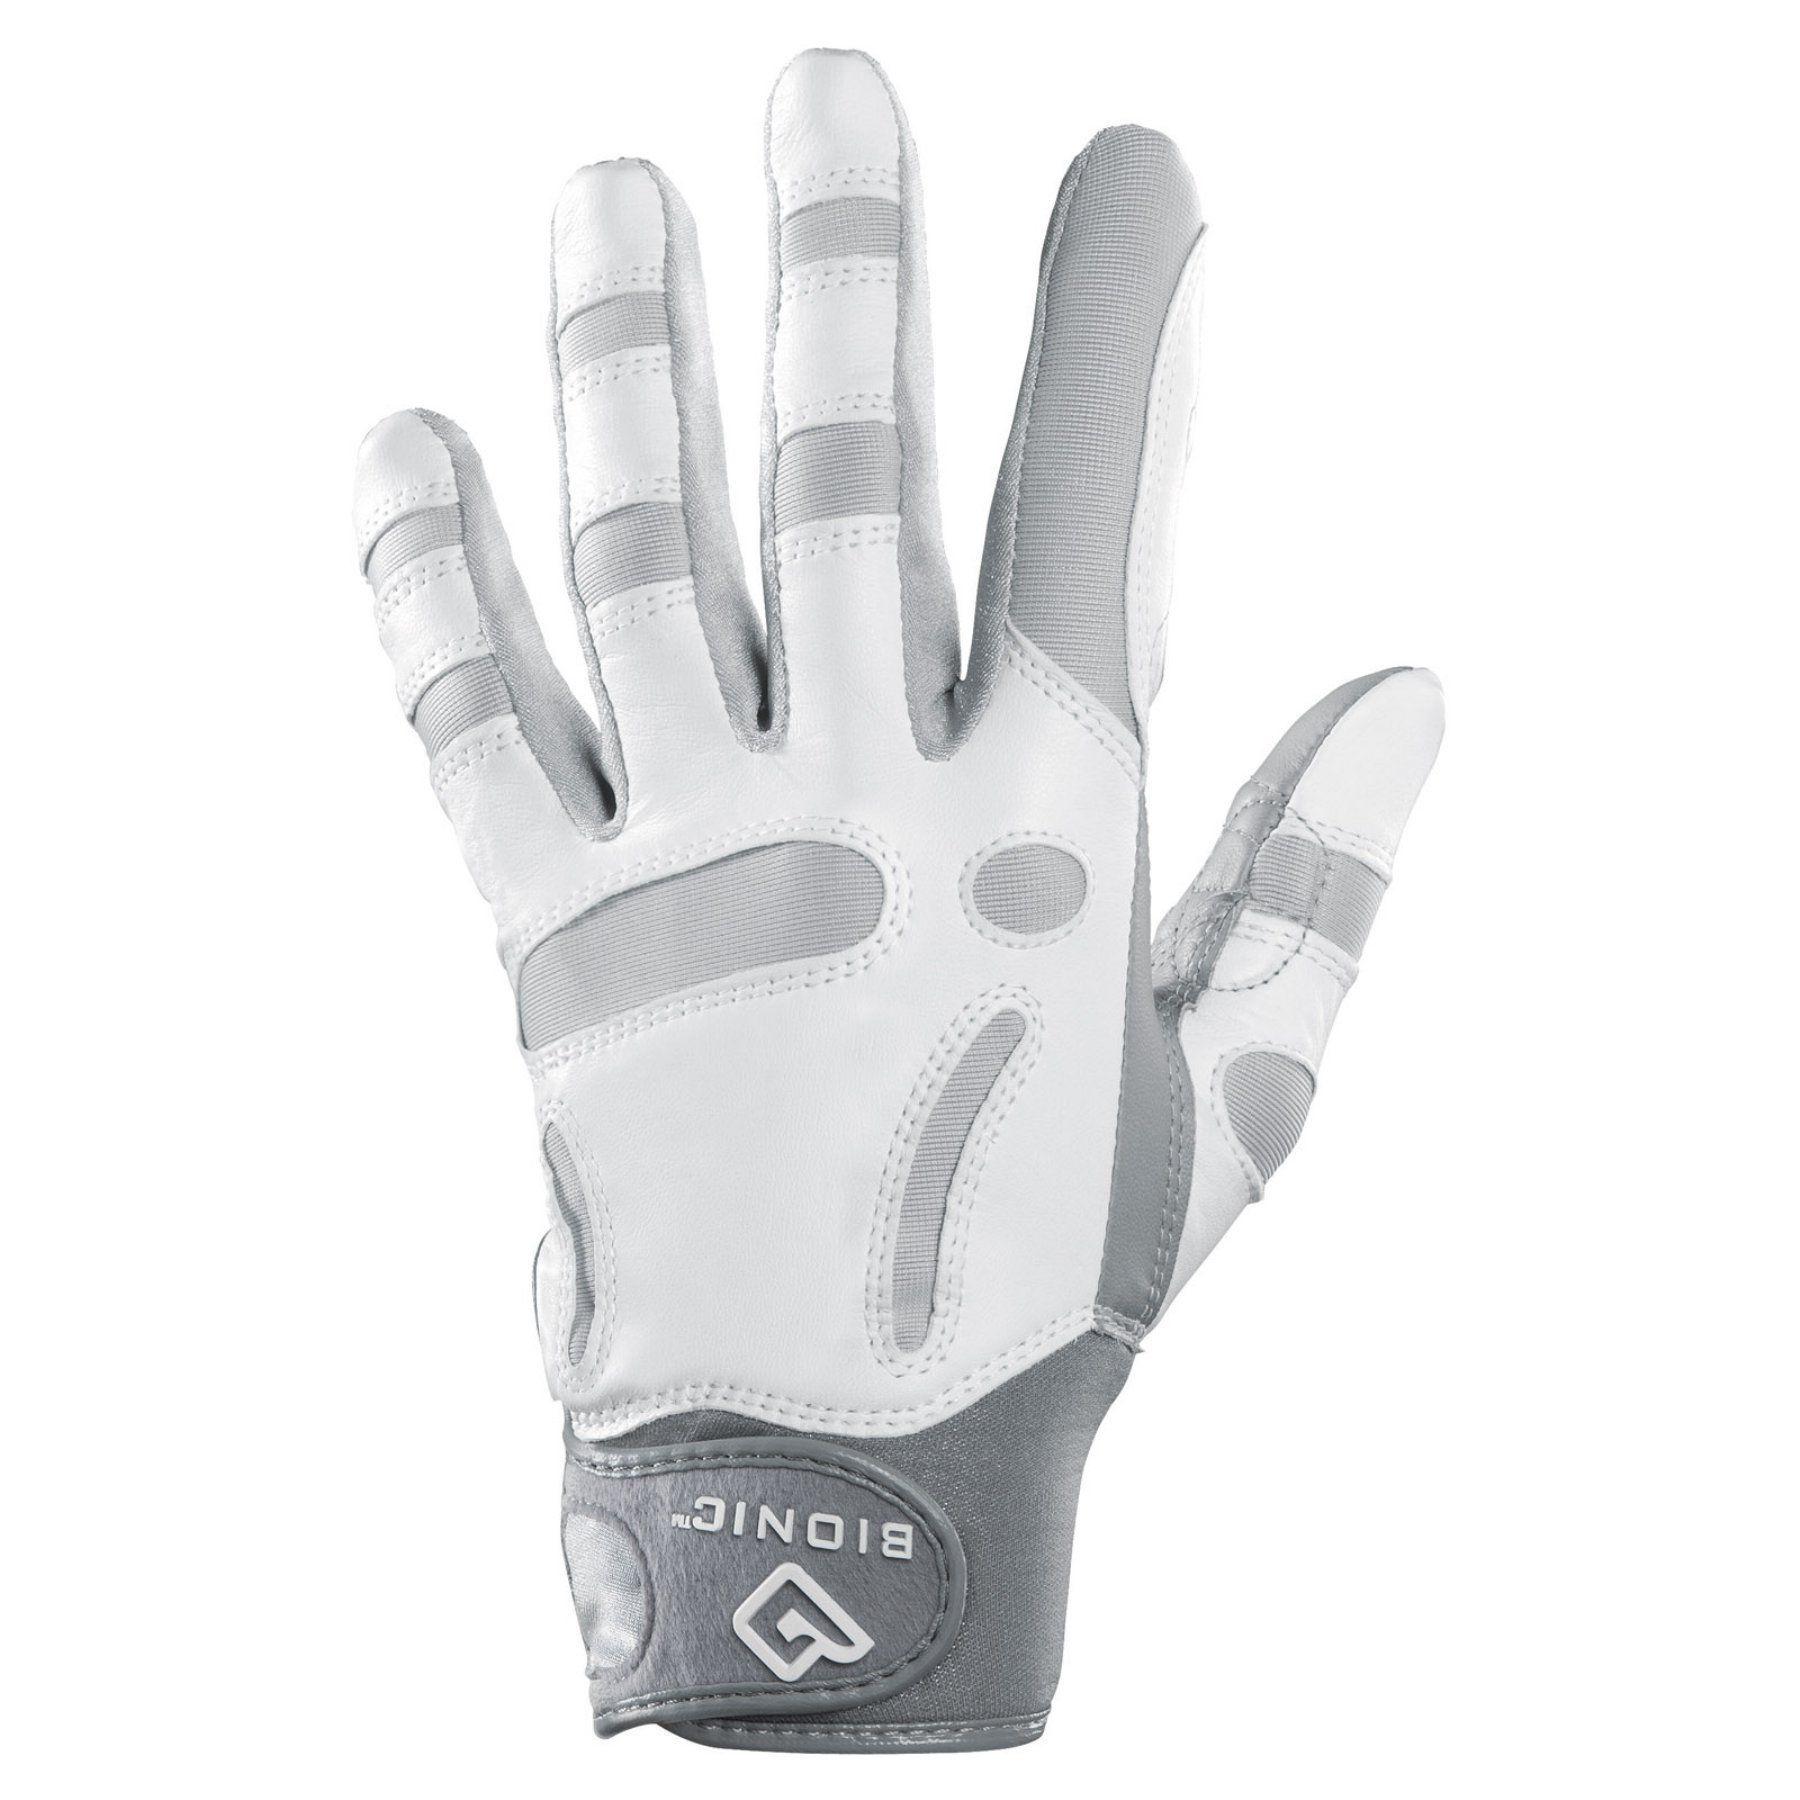 Bionic Womens ReliefGrip Golf Glove - Left - GRLFWLS